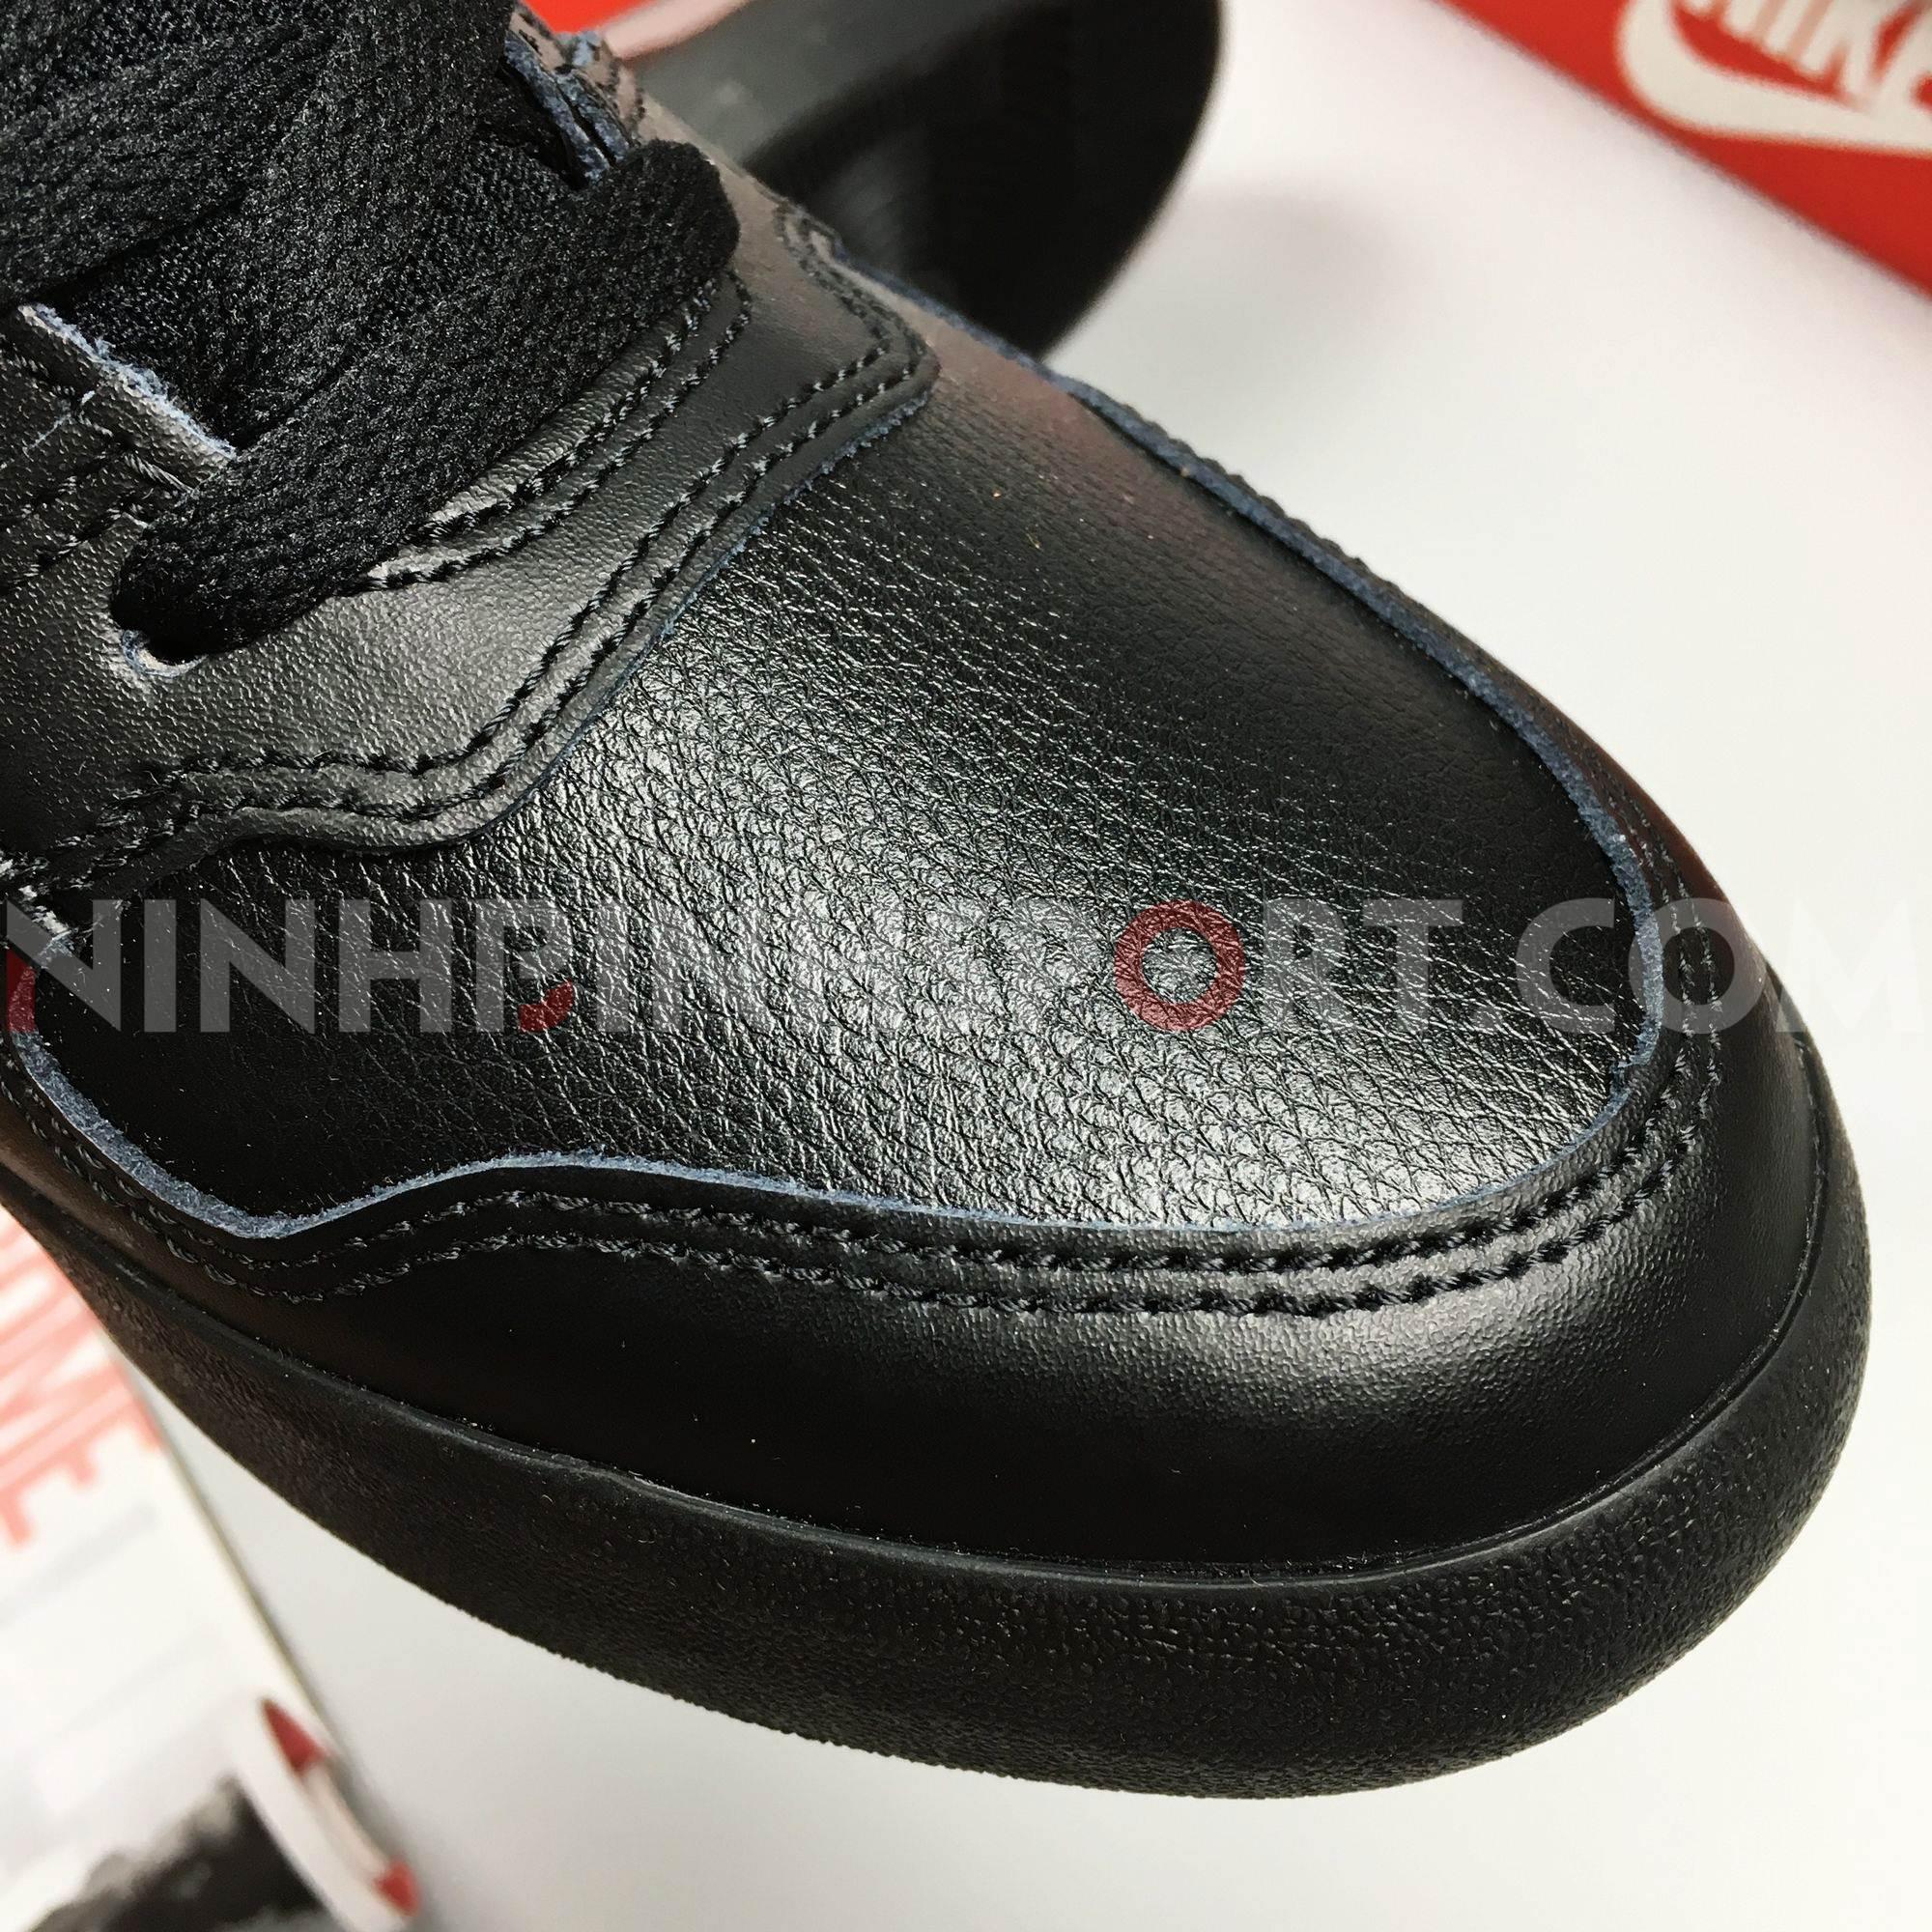 Giày thể thao nam Nike SB Delta Force Vulc 942237-002